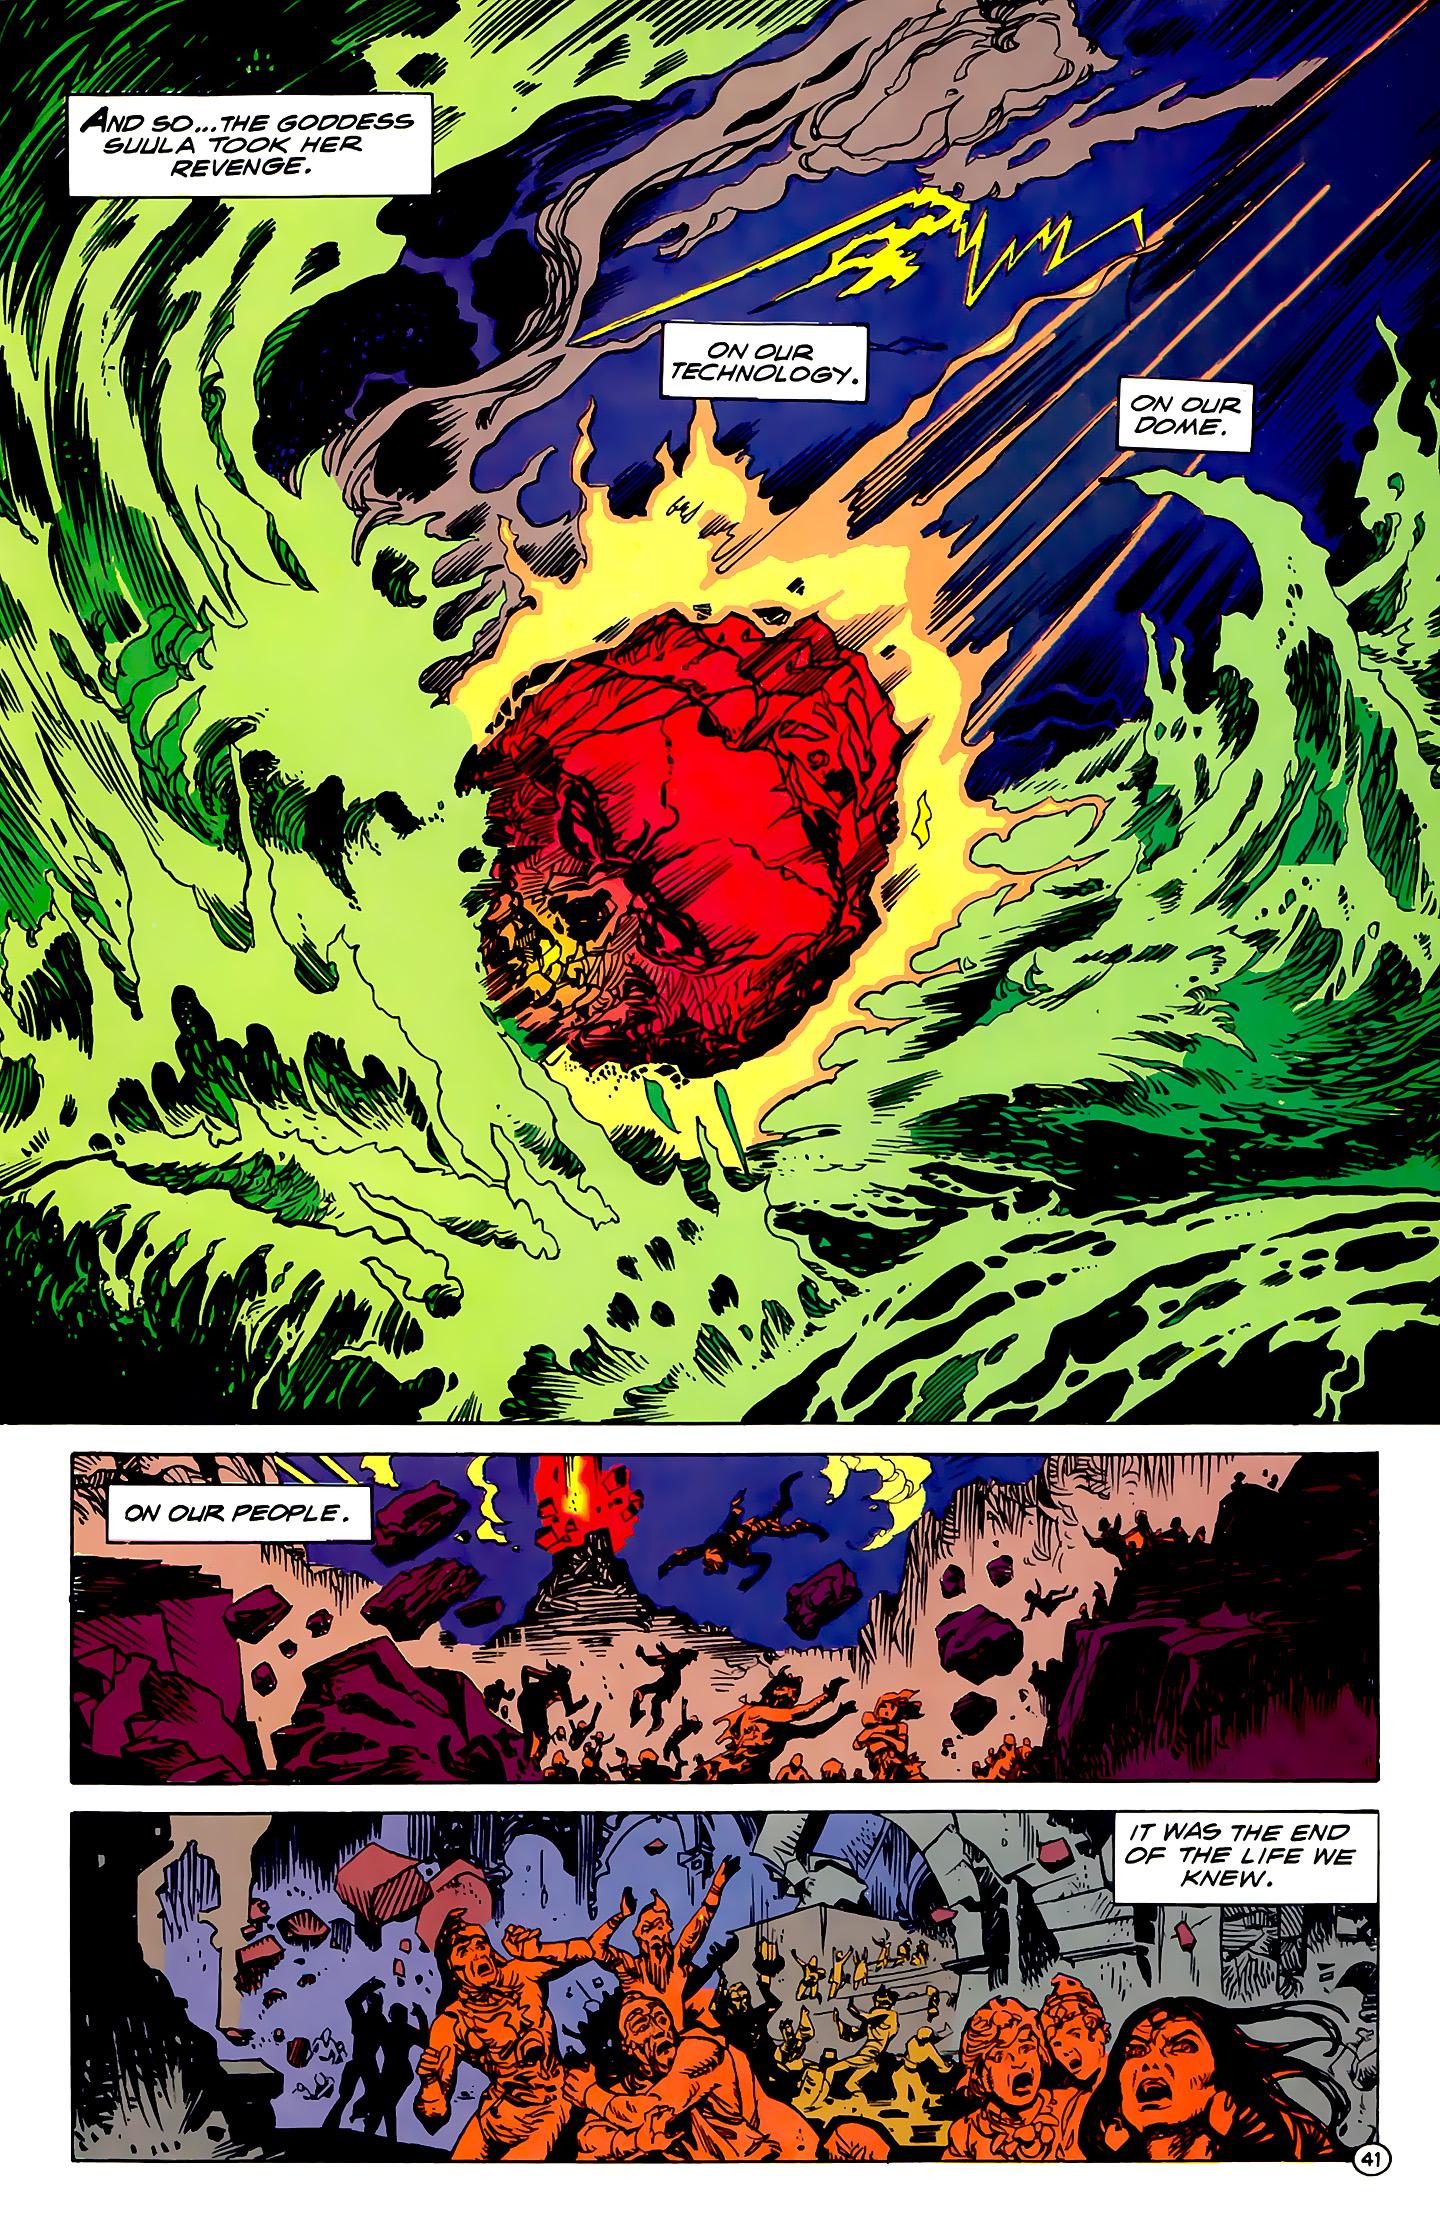 Read online Atlantis Chronicles comic -  Issue #1 - 41